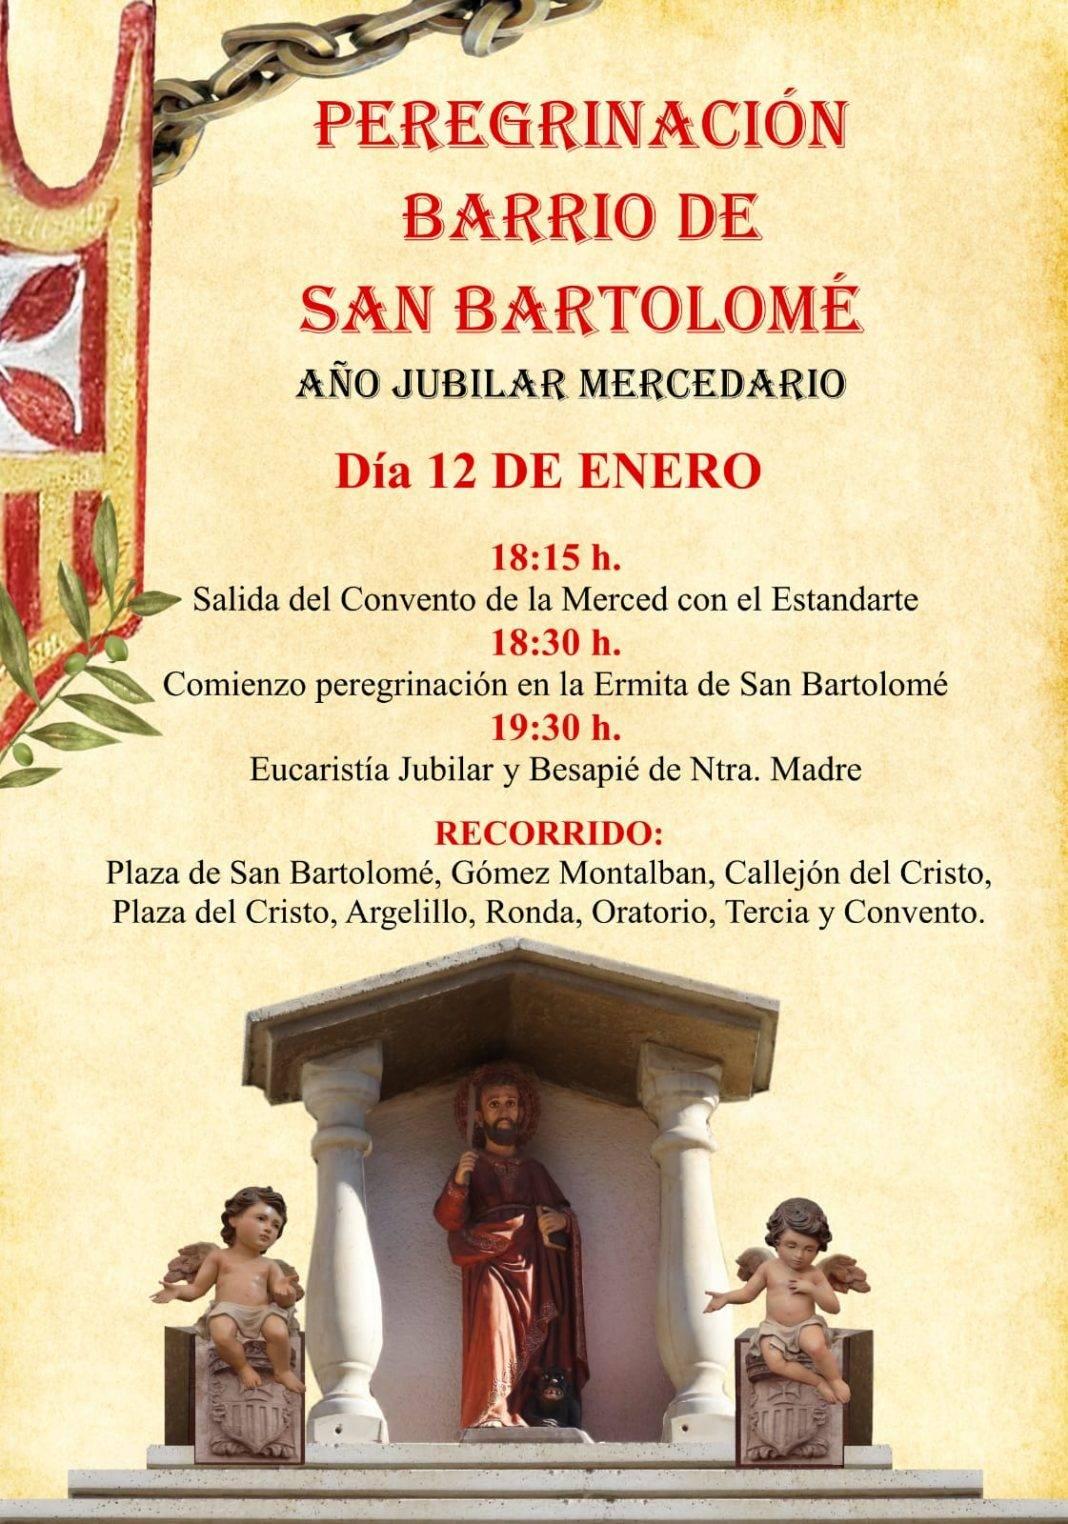 Peregrinación jubilar mercedaria del barrio de San Bartolomé 4